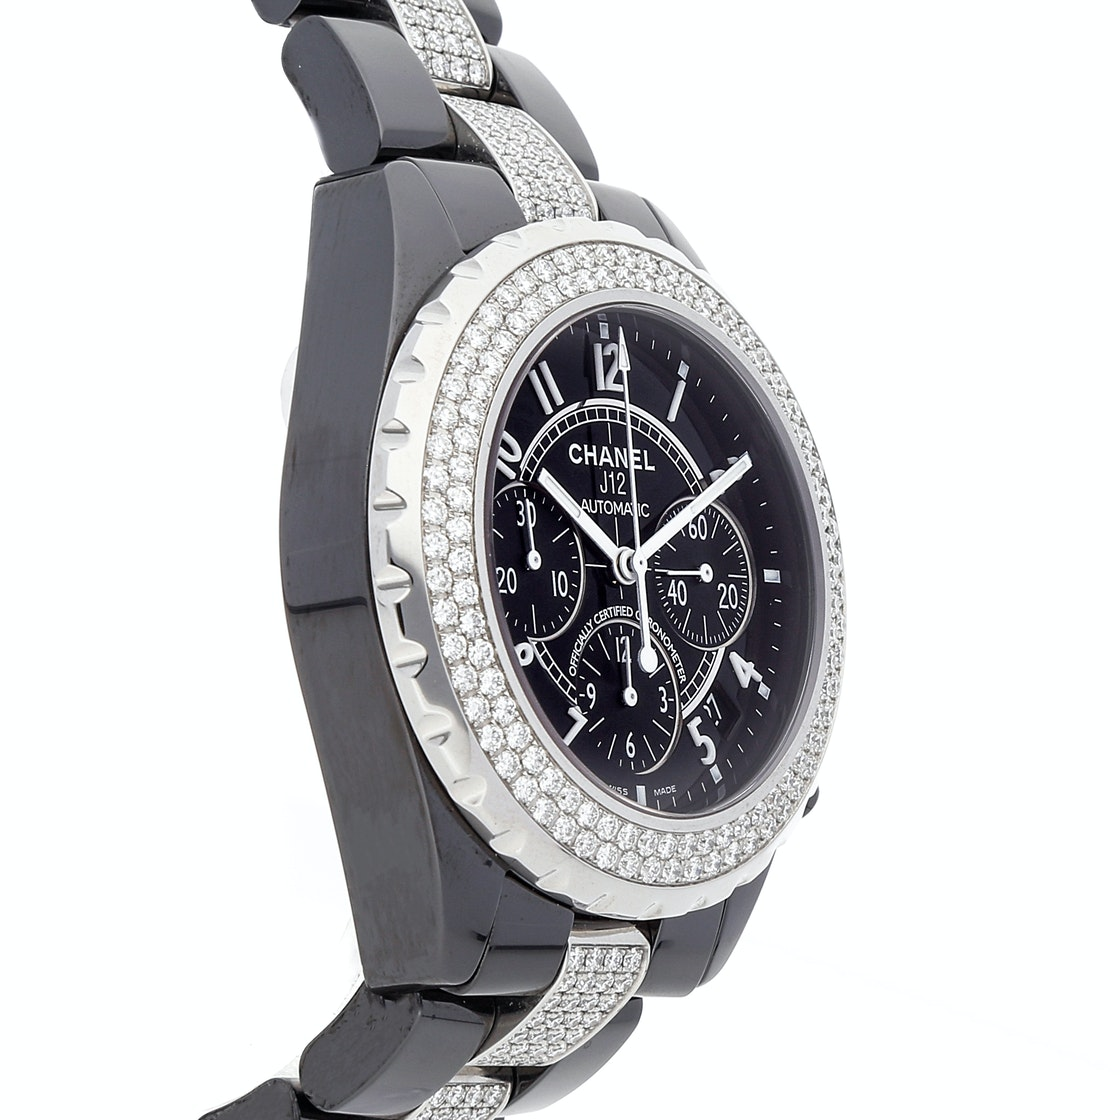 Chanel J12 Chronograph H1706